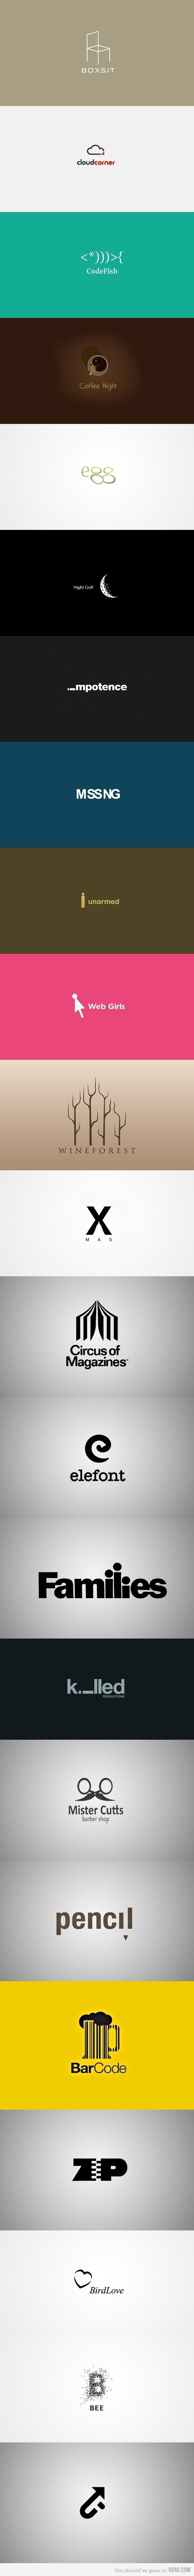 Logo inspiration #logos #design #graphic